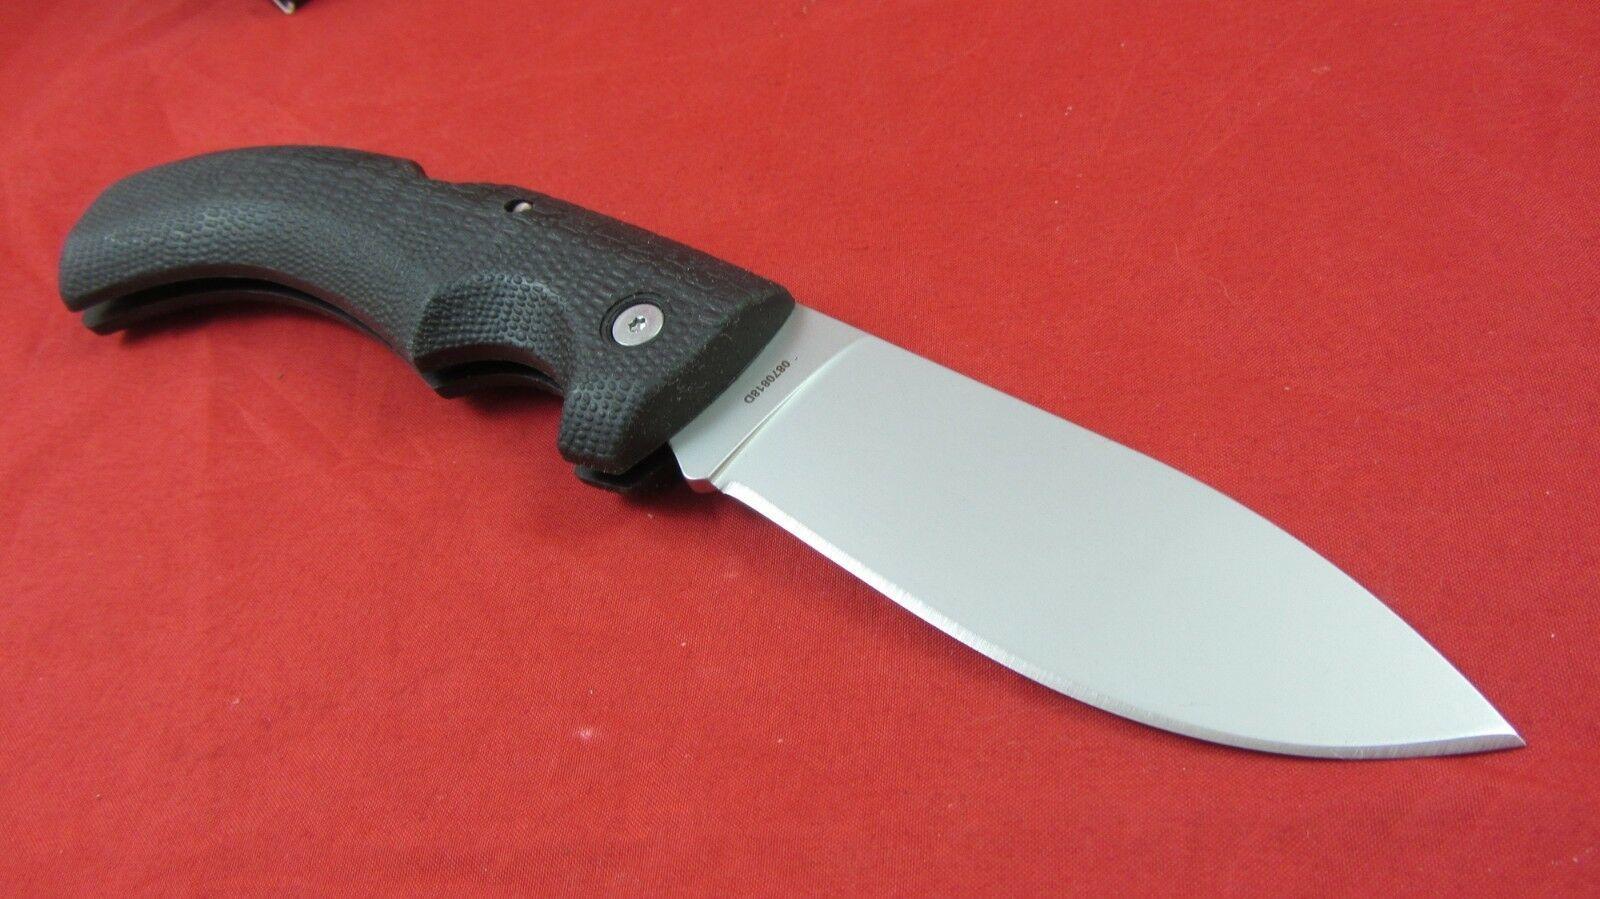 Фото 9 - Складной нож Gerber Gator 154, сталь 154CM, рукоять glassfilled